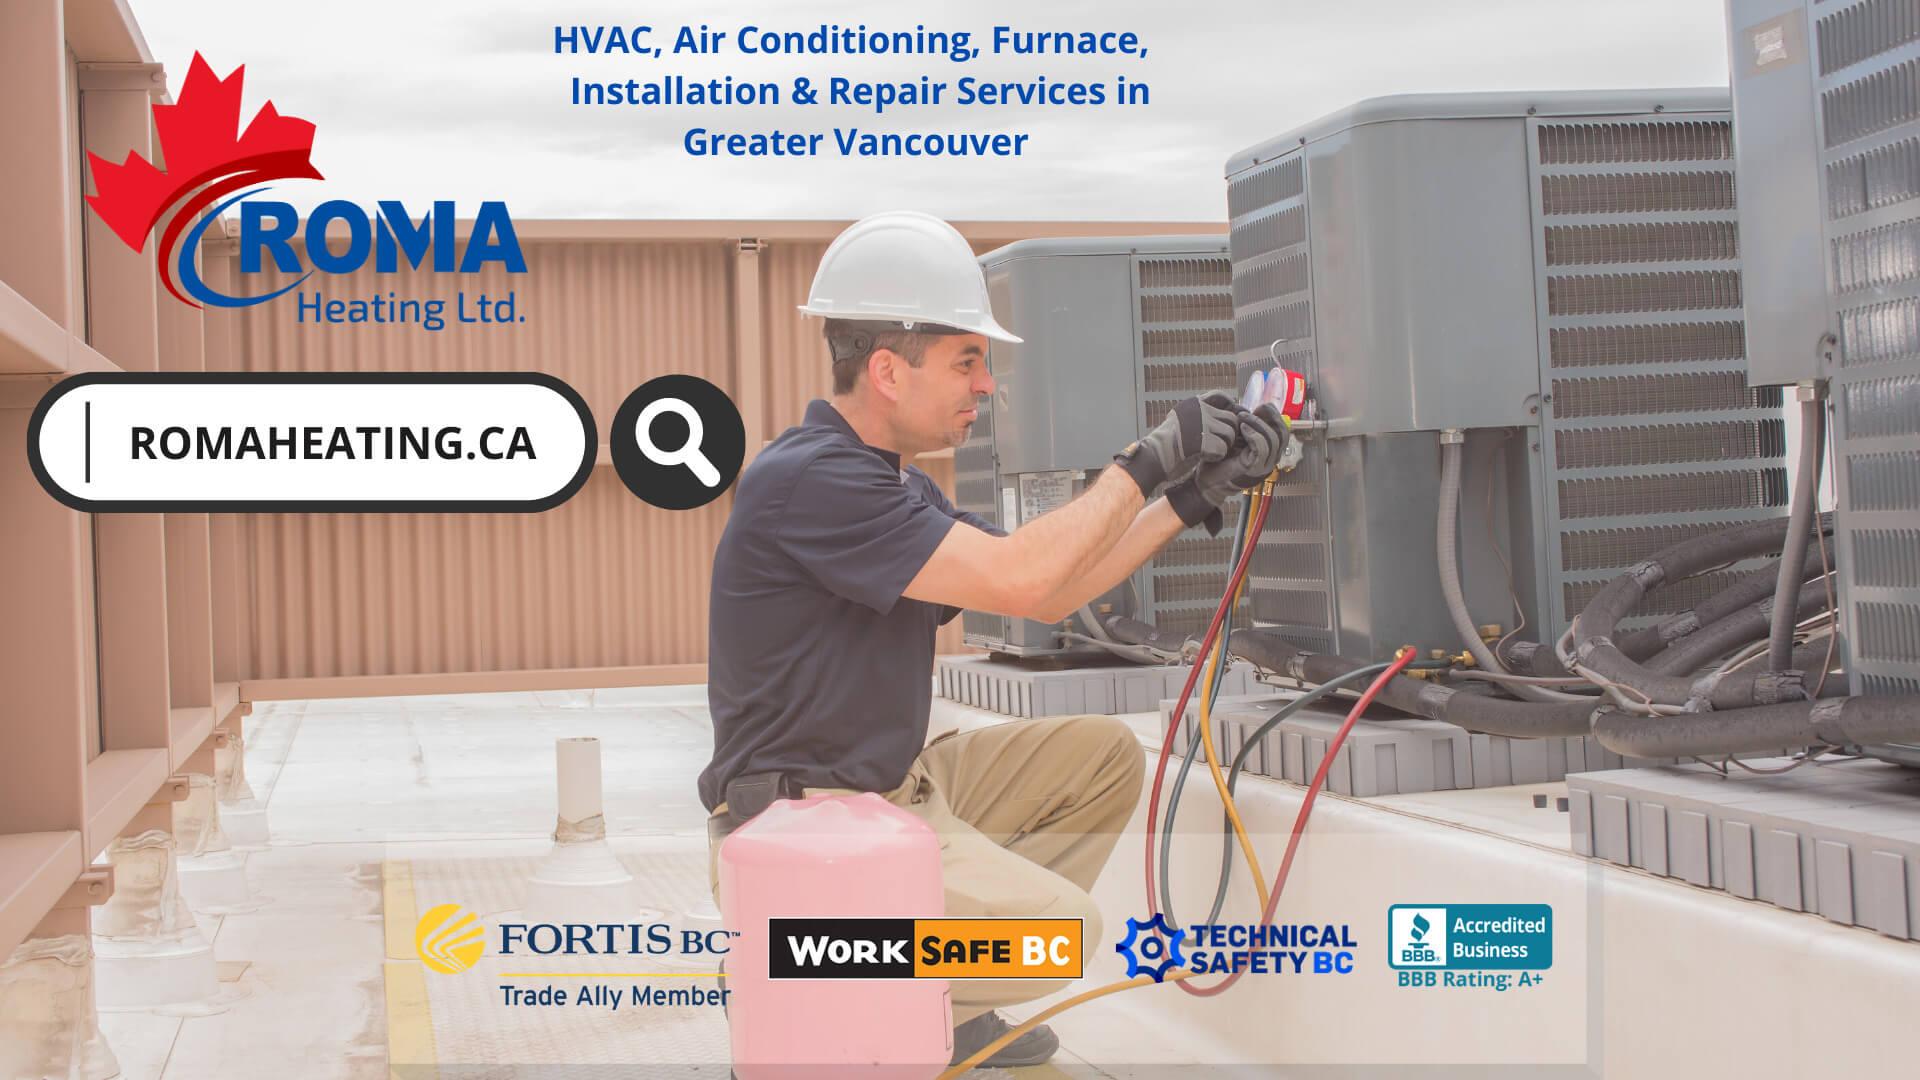 Air Conditioning Installation, Maintenance & Repair Services 4